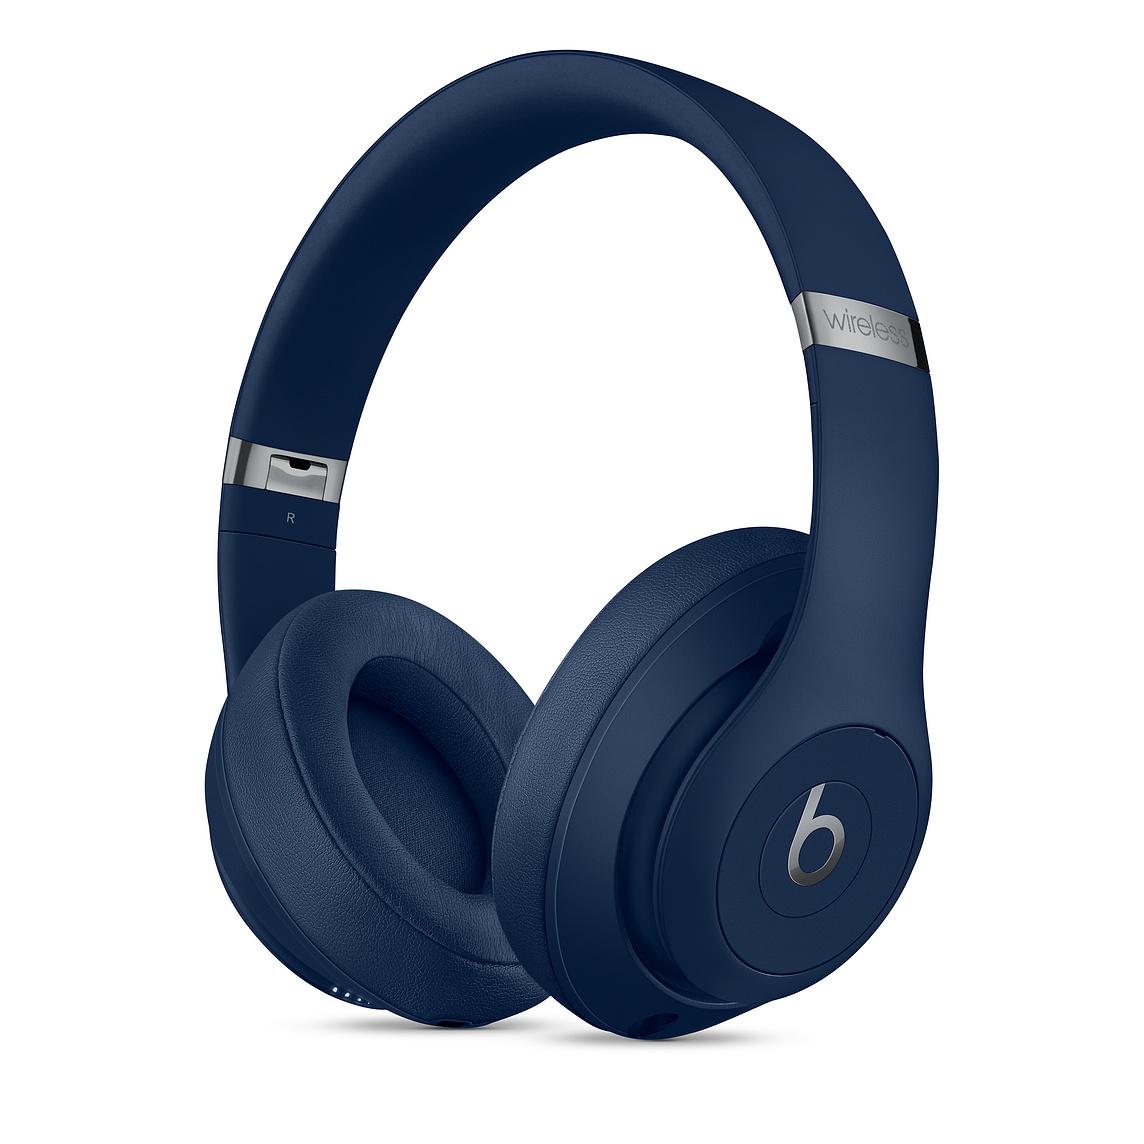 Apple Beats Studio3 무선 오버이어 헤드폰, 블루, MX402PA/A